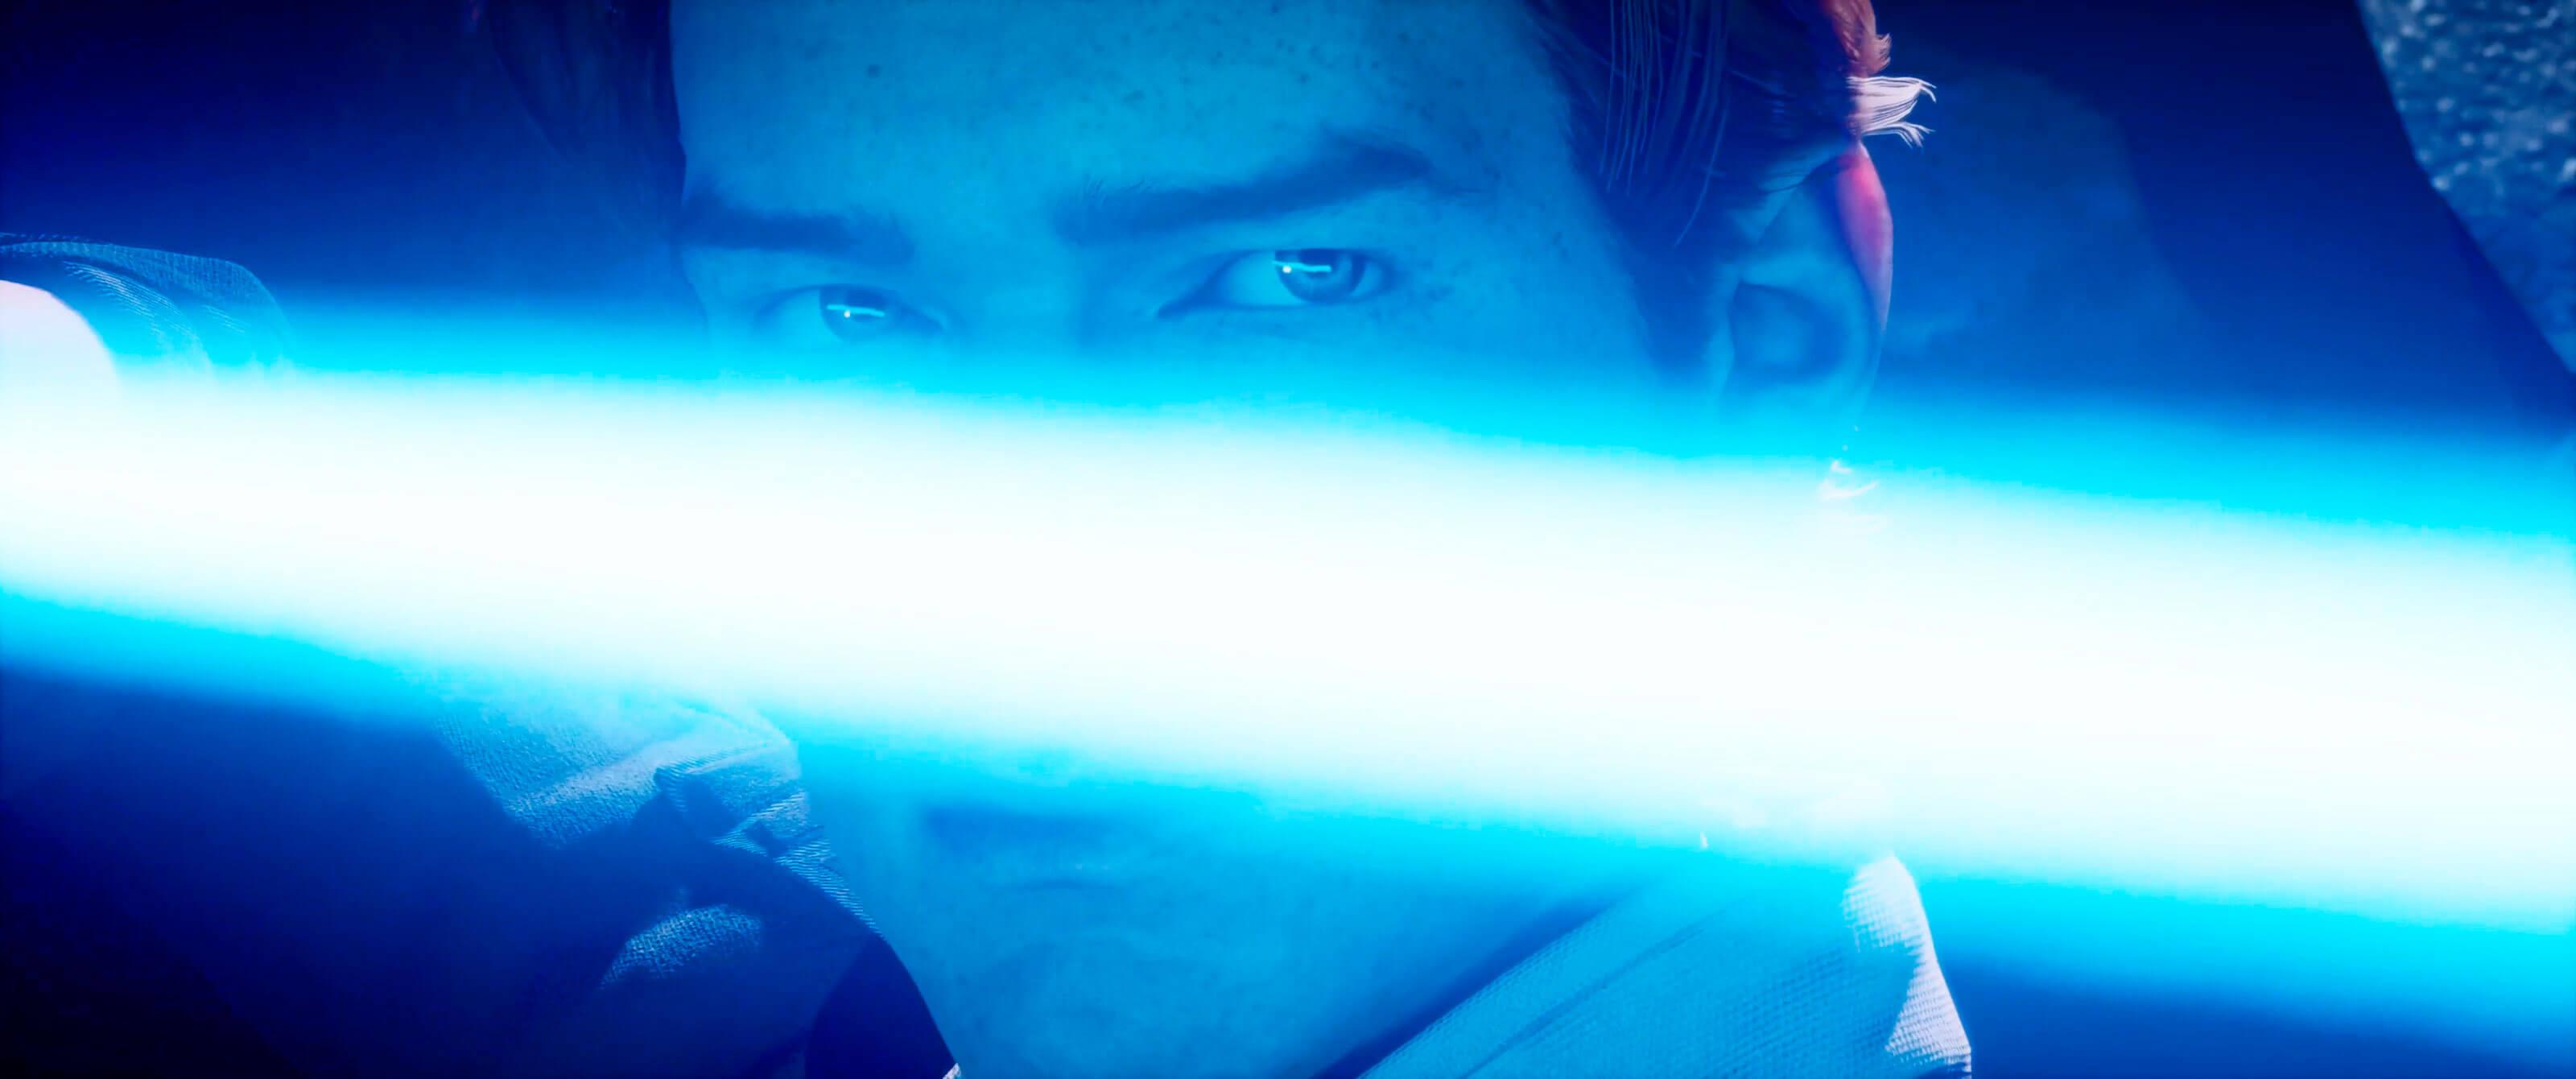 Star Wars Jedi Fallen Order Anuncio 3